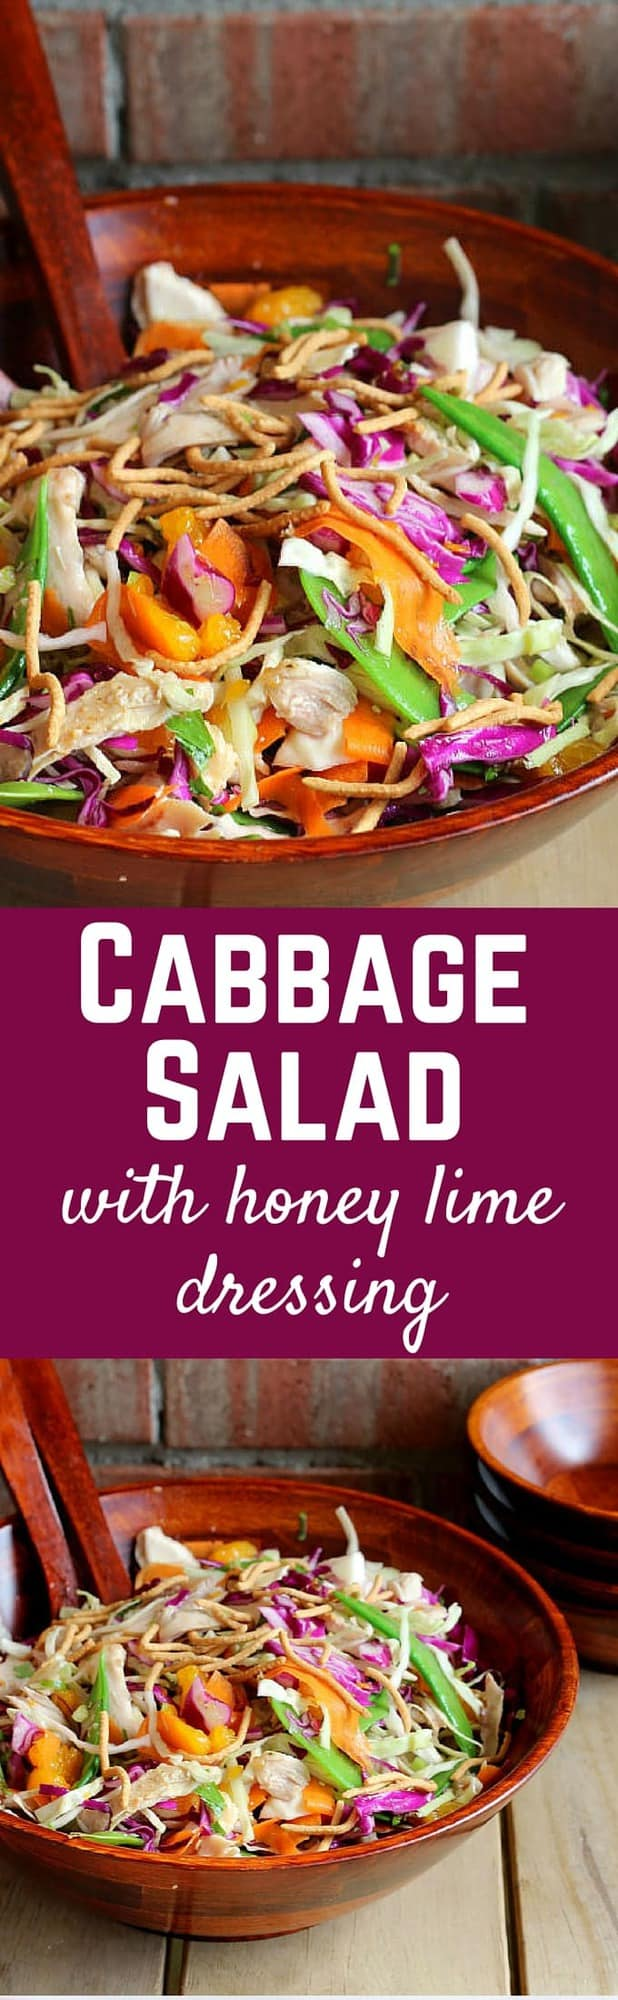 Easy Cabbage Salad using Rotisserie Chicken   RachelCooks.com